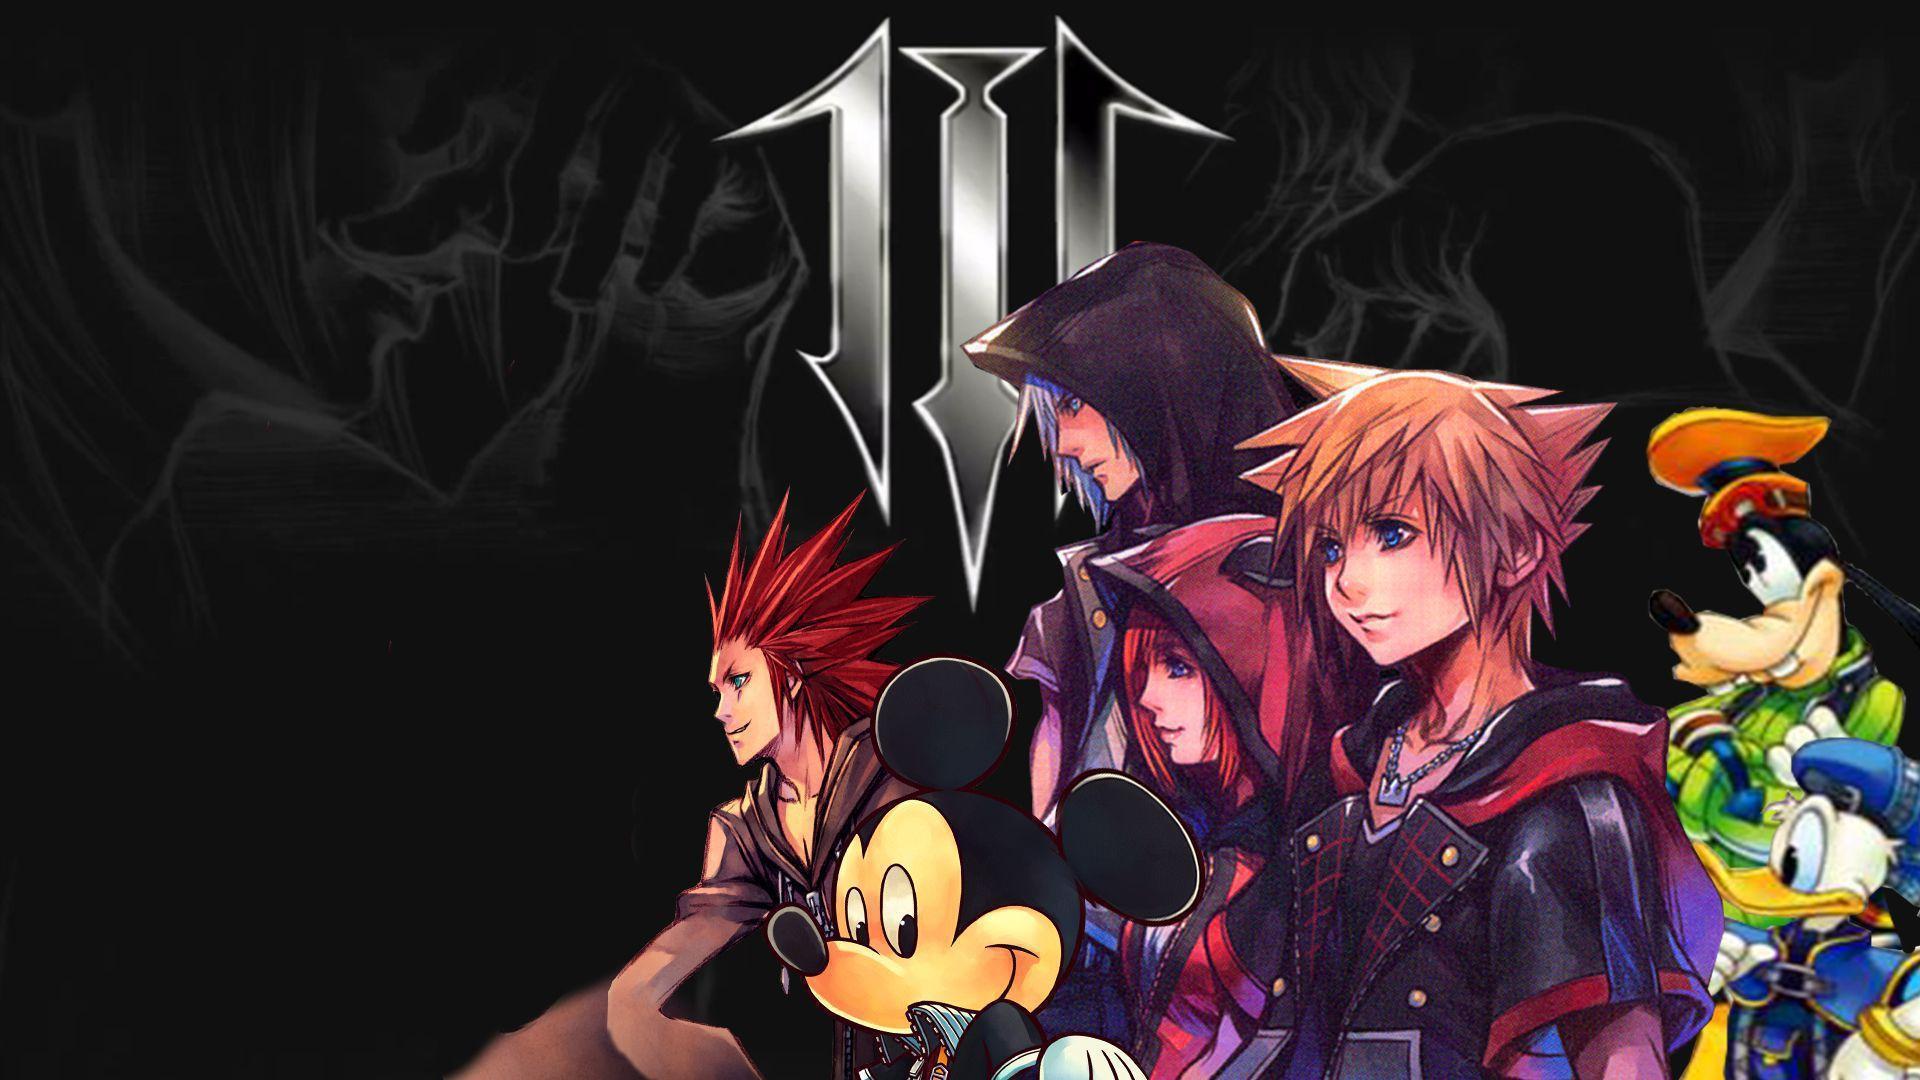 Kingdom Hearts 3 Wallpapers Top Free Kingdom Hearts 3